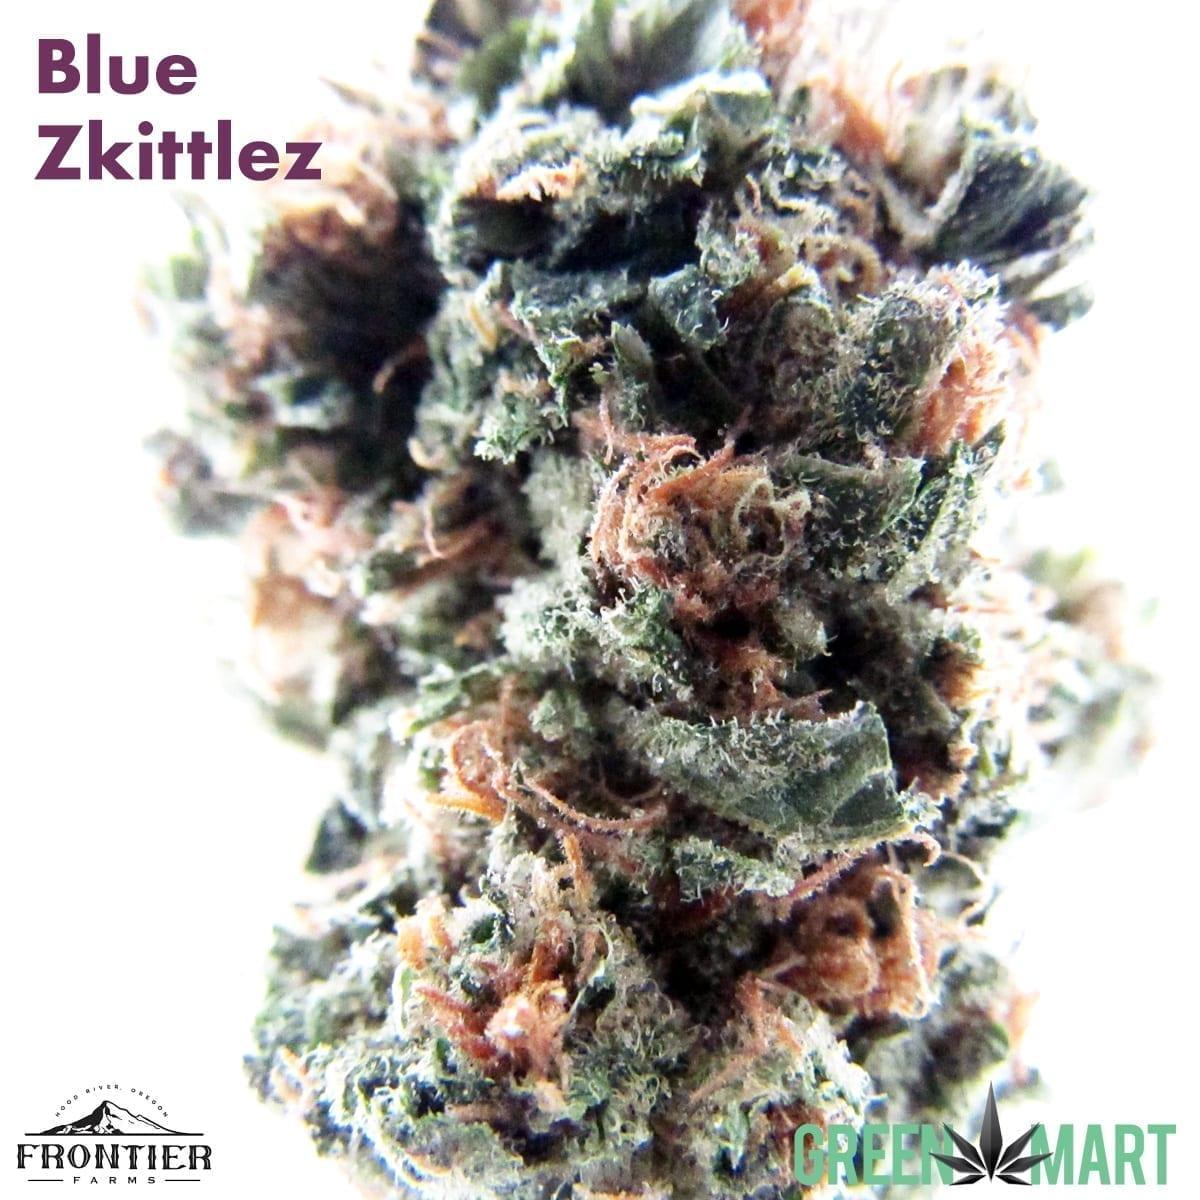 Frontier Farms - Blue Zkittlez